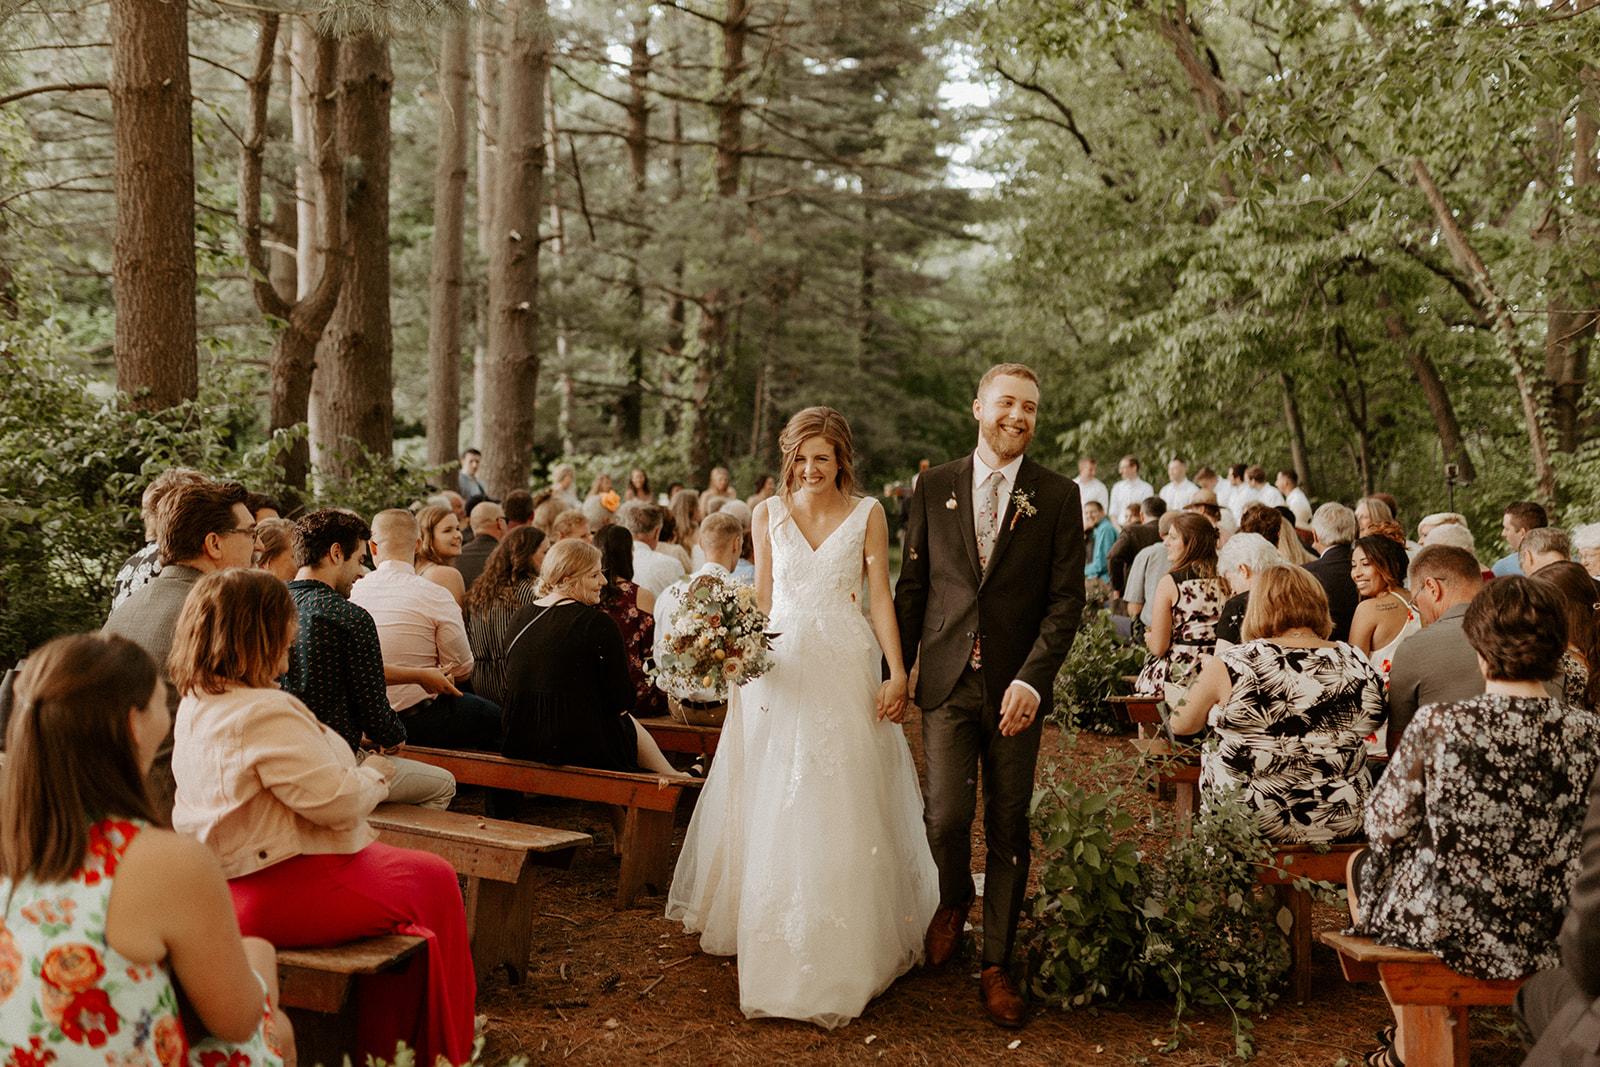 camp_wokanda_peoria_illinois_wedding_photographer_wright_photographs_bliese_0286.jpg